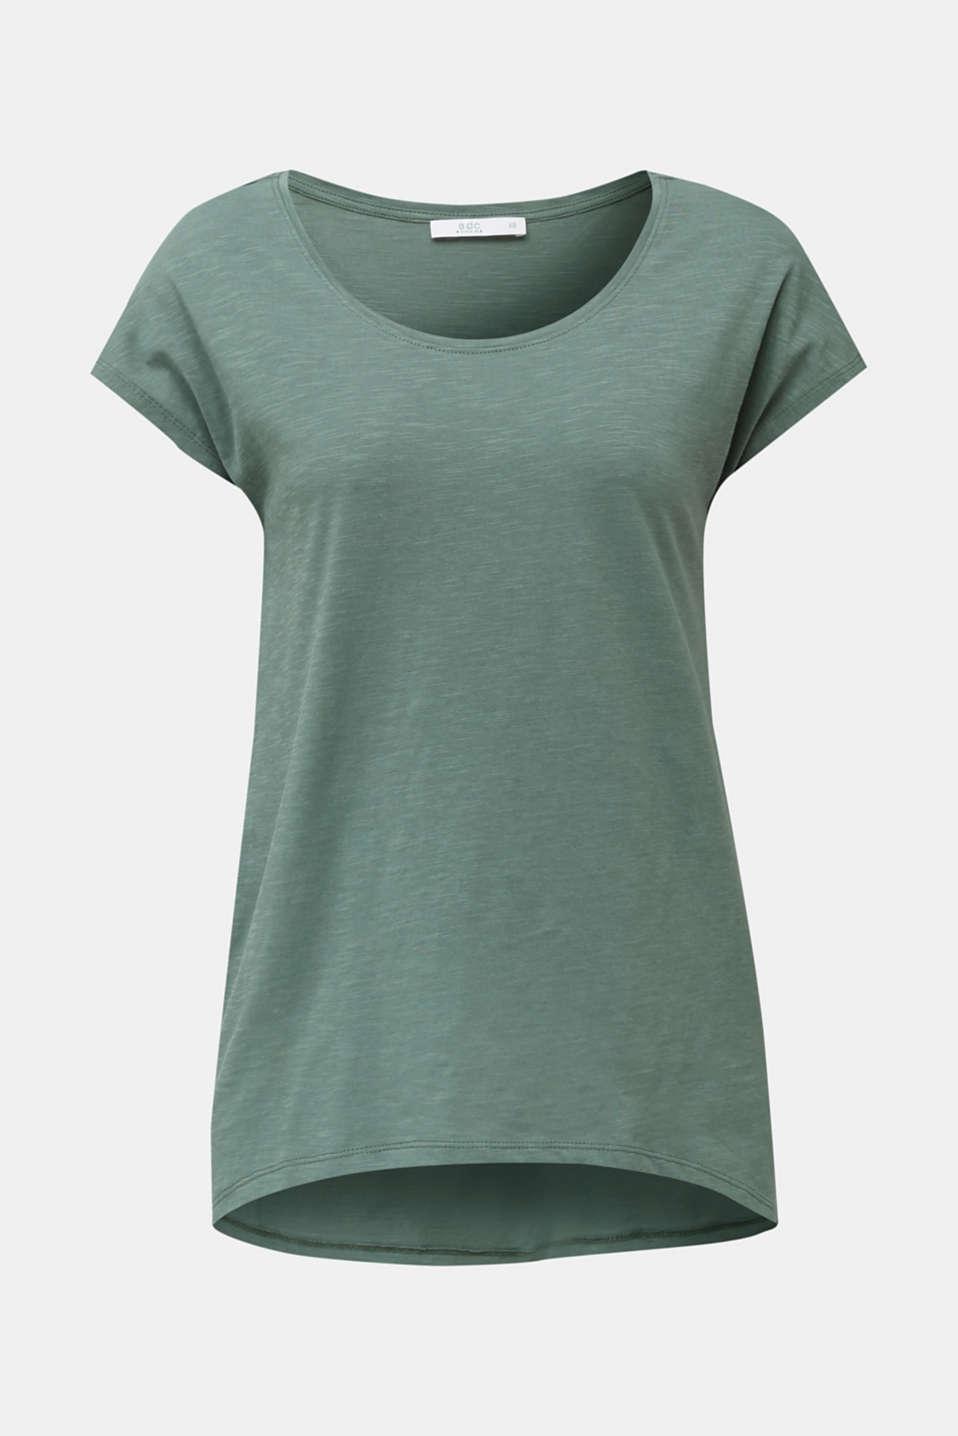 Slub top with high-low hem, 100% cotton, KHAKI GREEN, detail image number 5